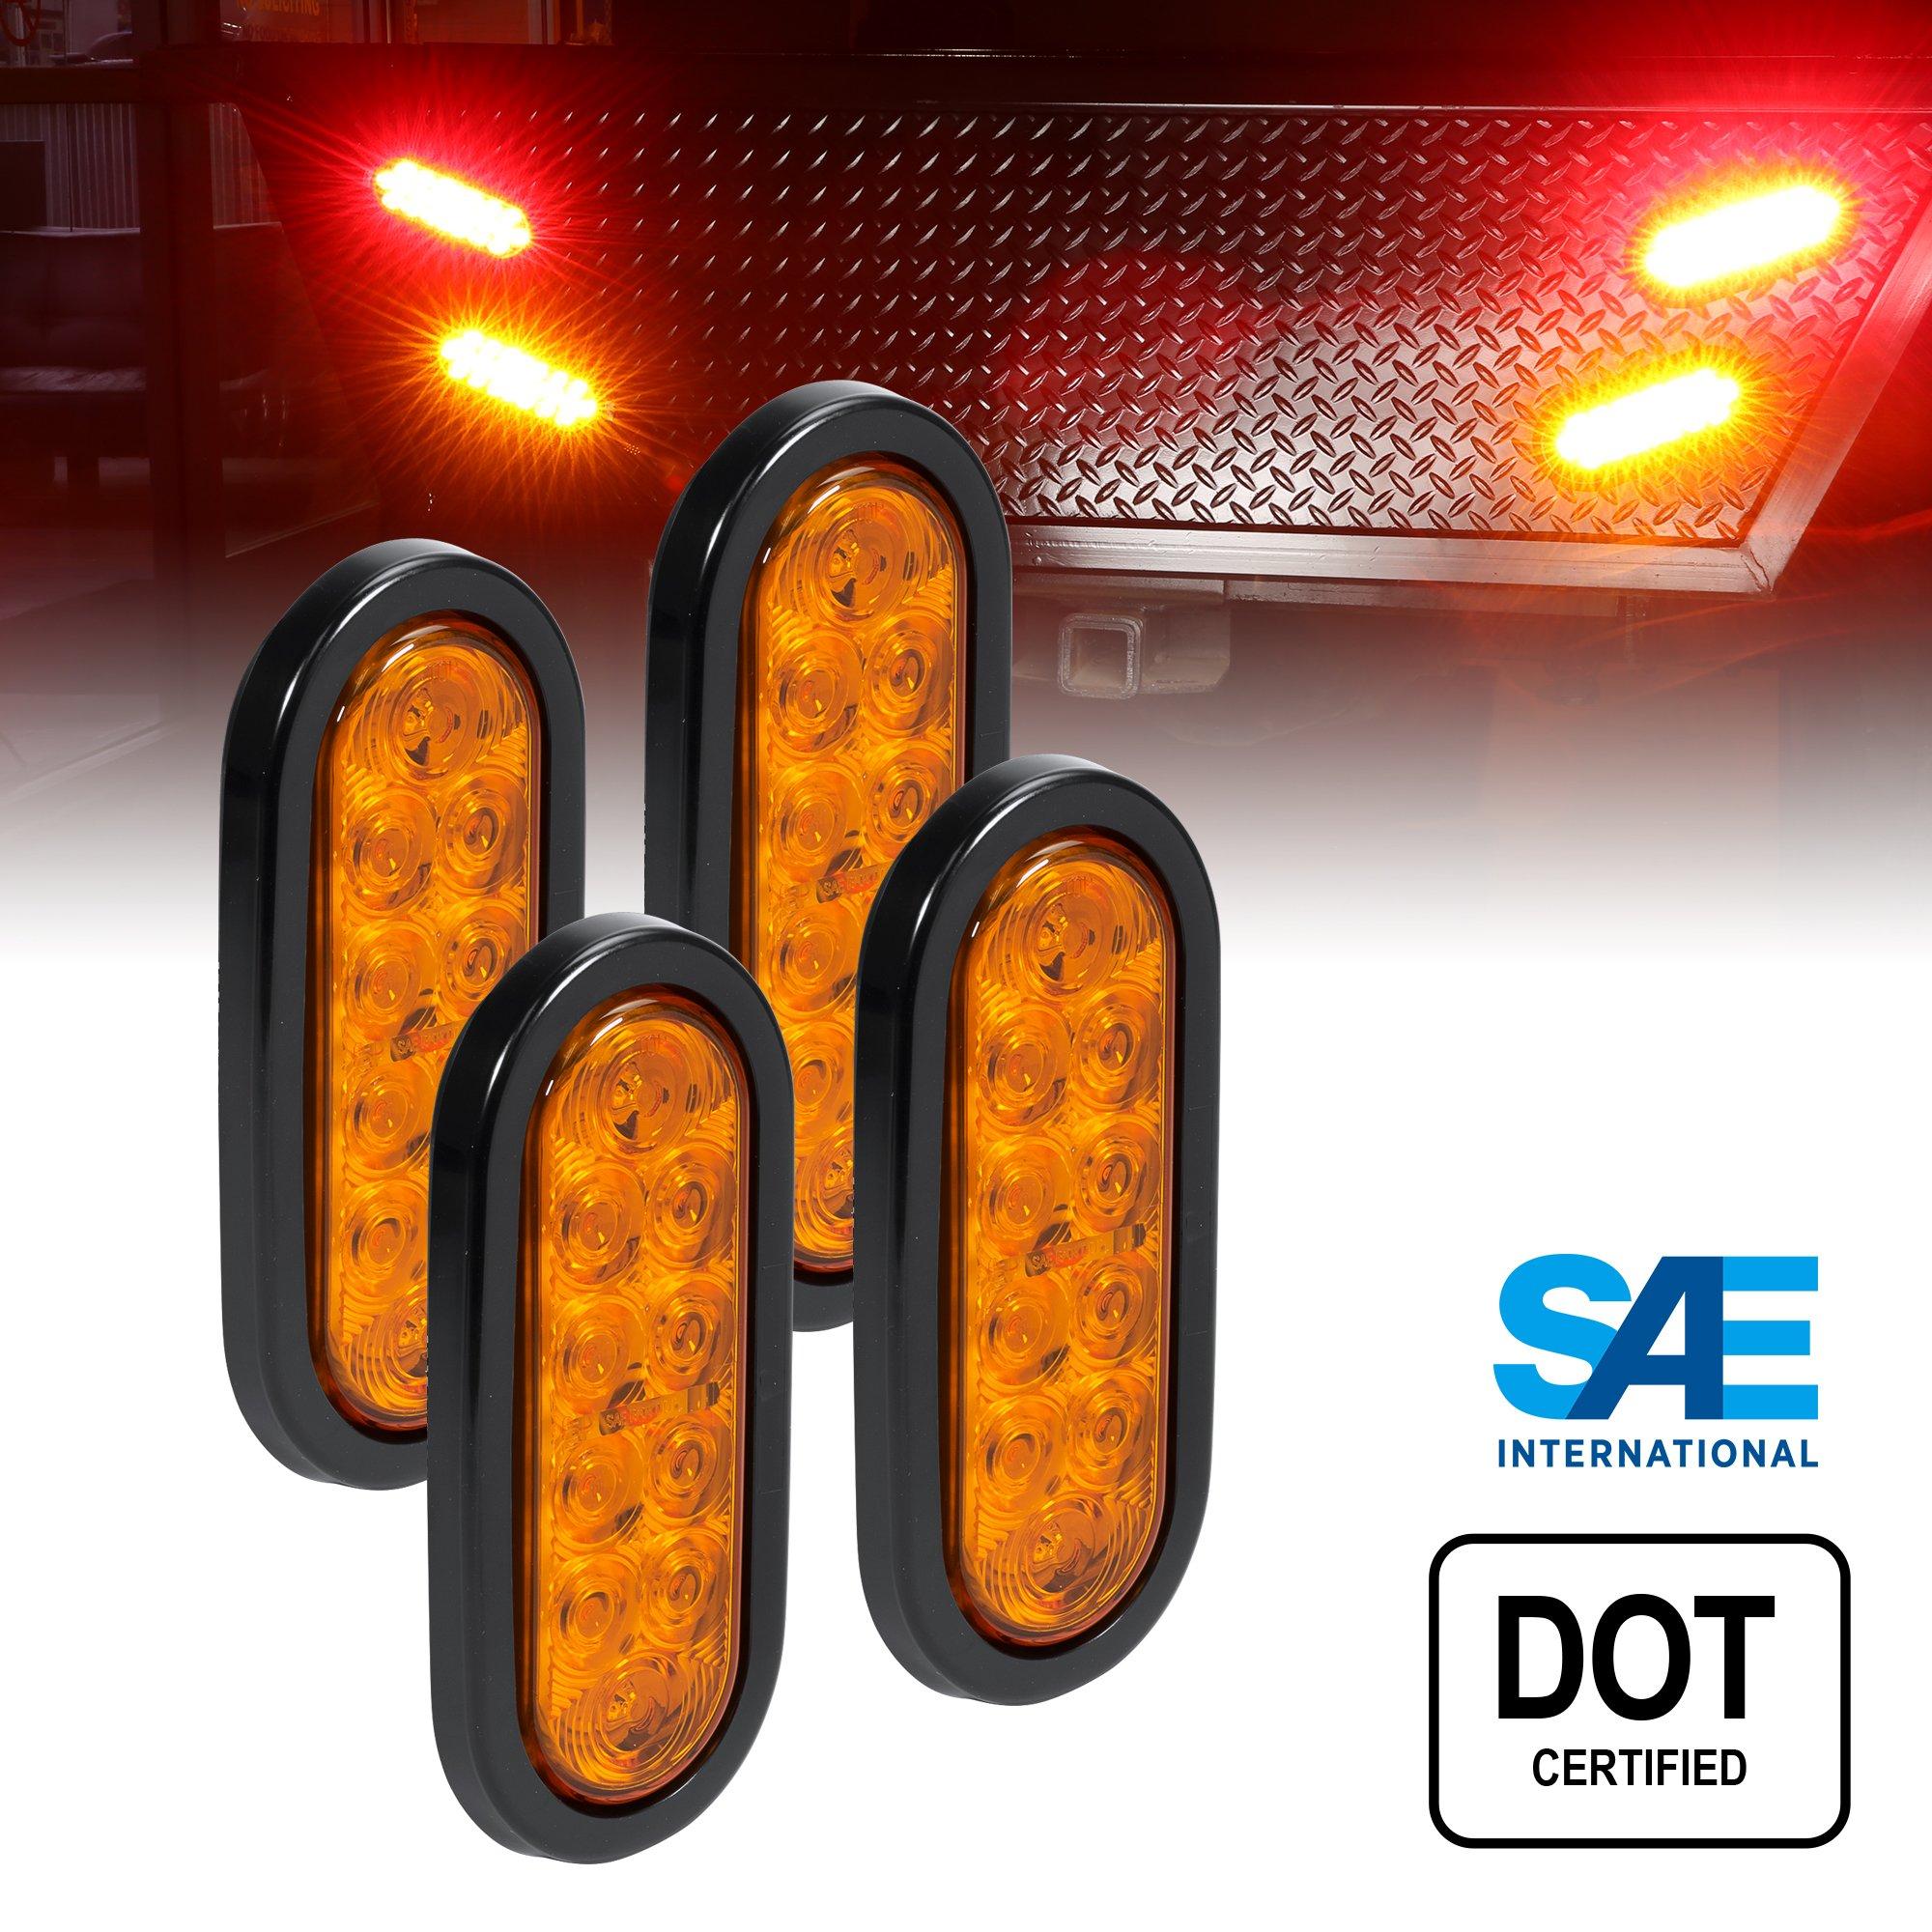 4pc 6'' Oval LED Trailer Tail Lights - AMBER LED Park Turn Trailer Lights for RV Trucks (DOT Certified, Grommet & Plug Included)